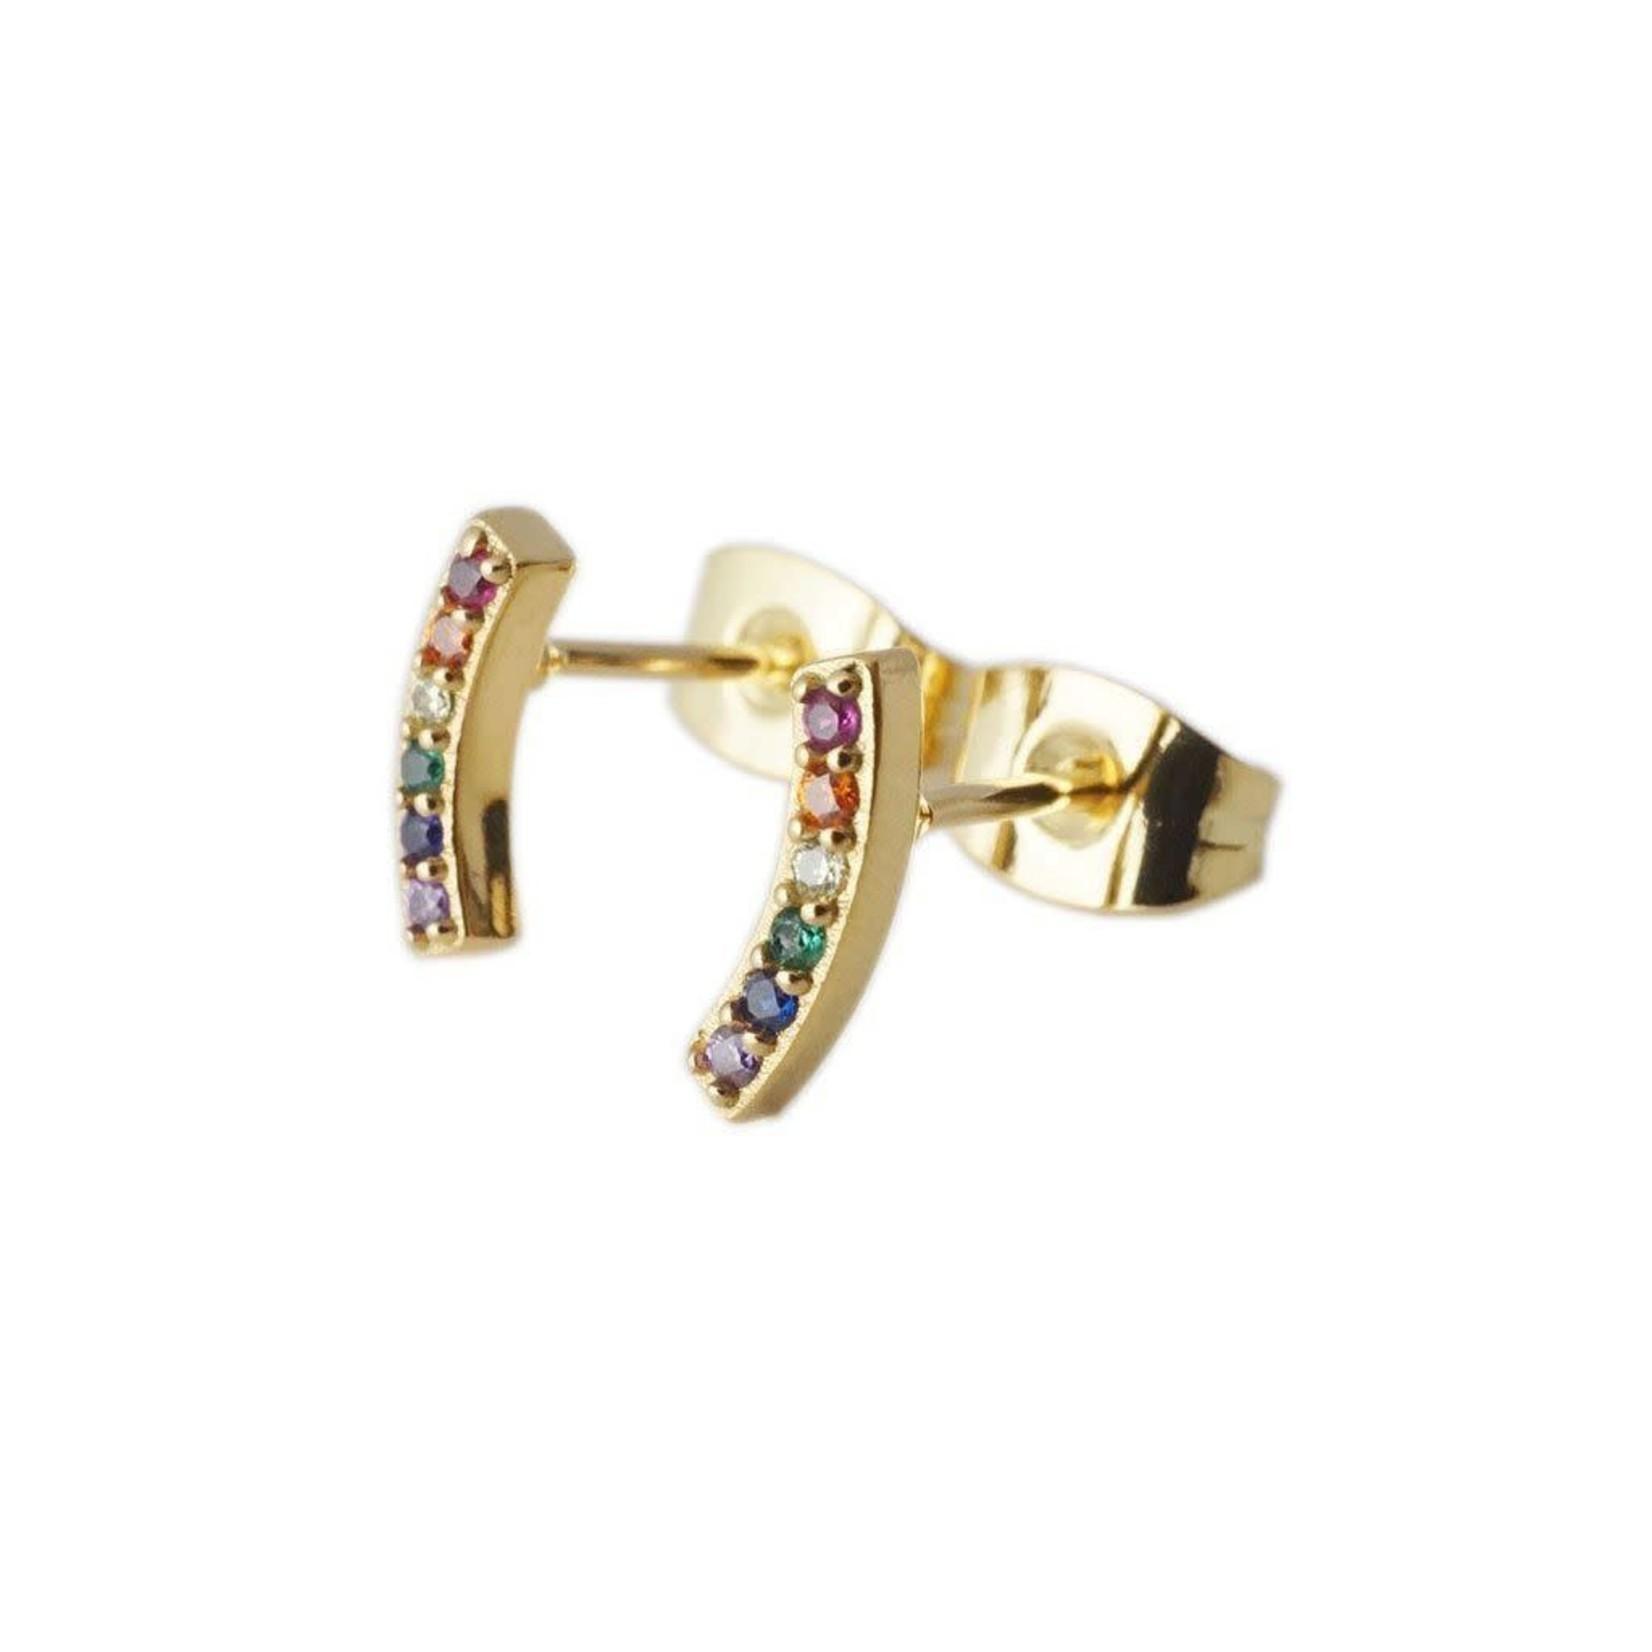 Honeycat Jewelry Honeycat Rainbow Crystal Arc Earrings